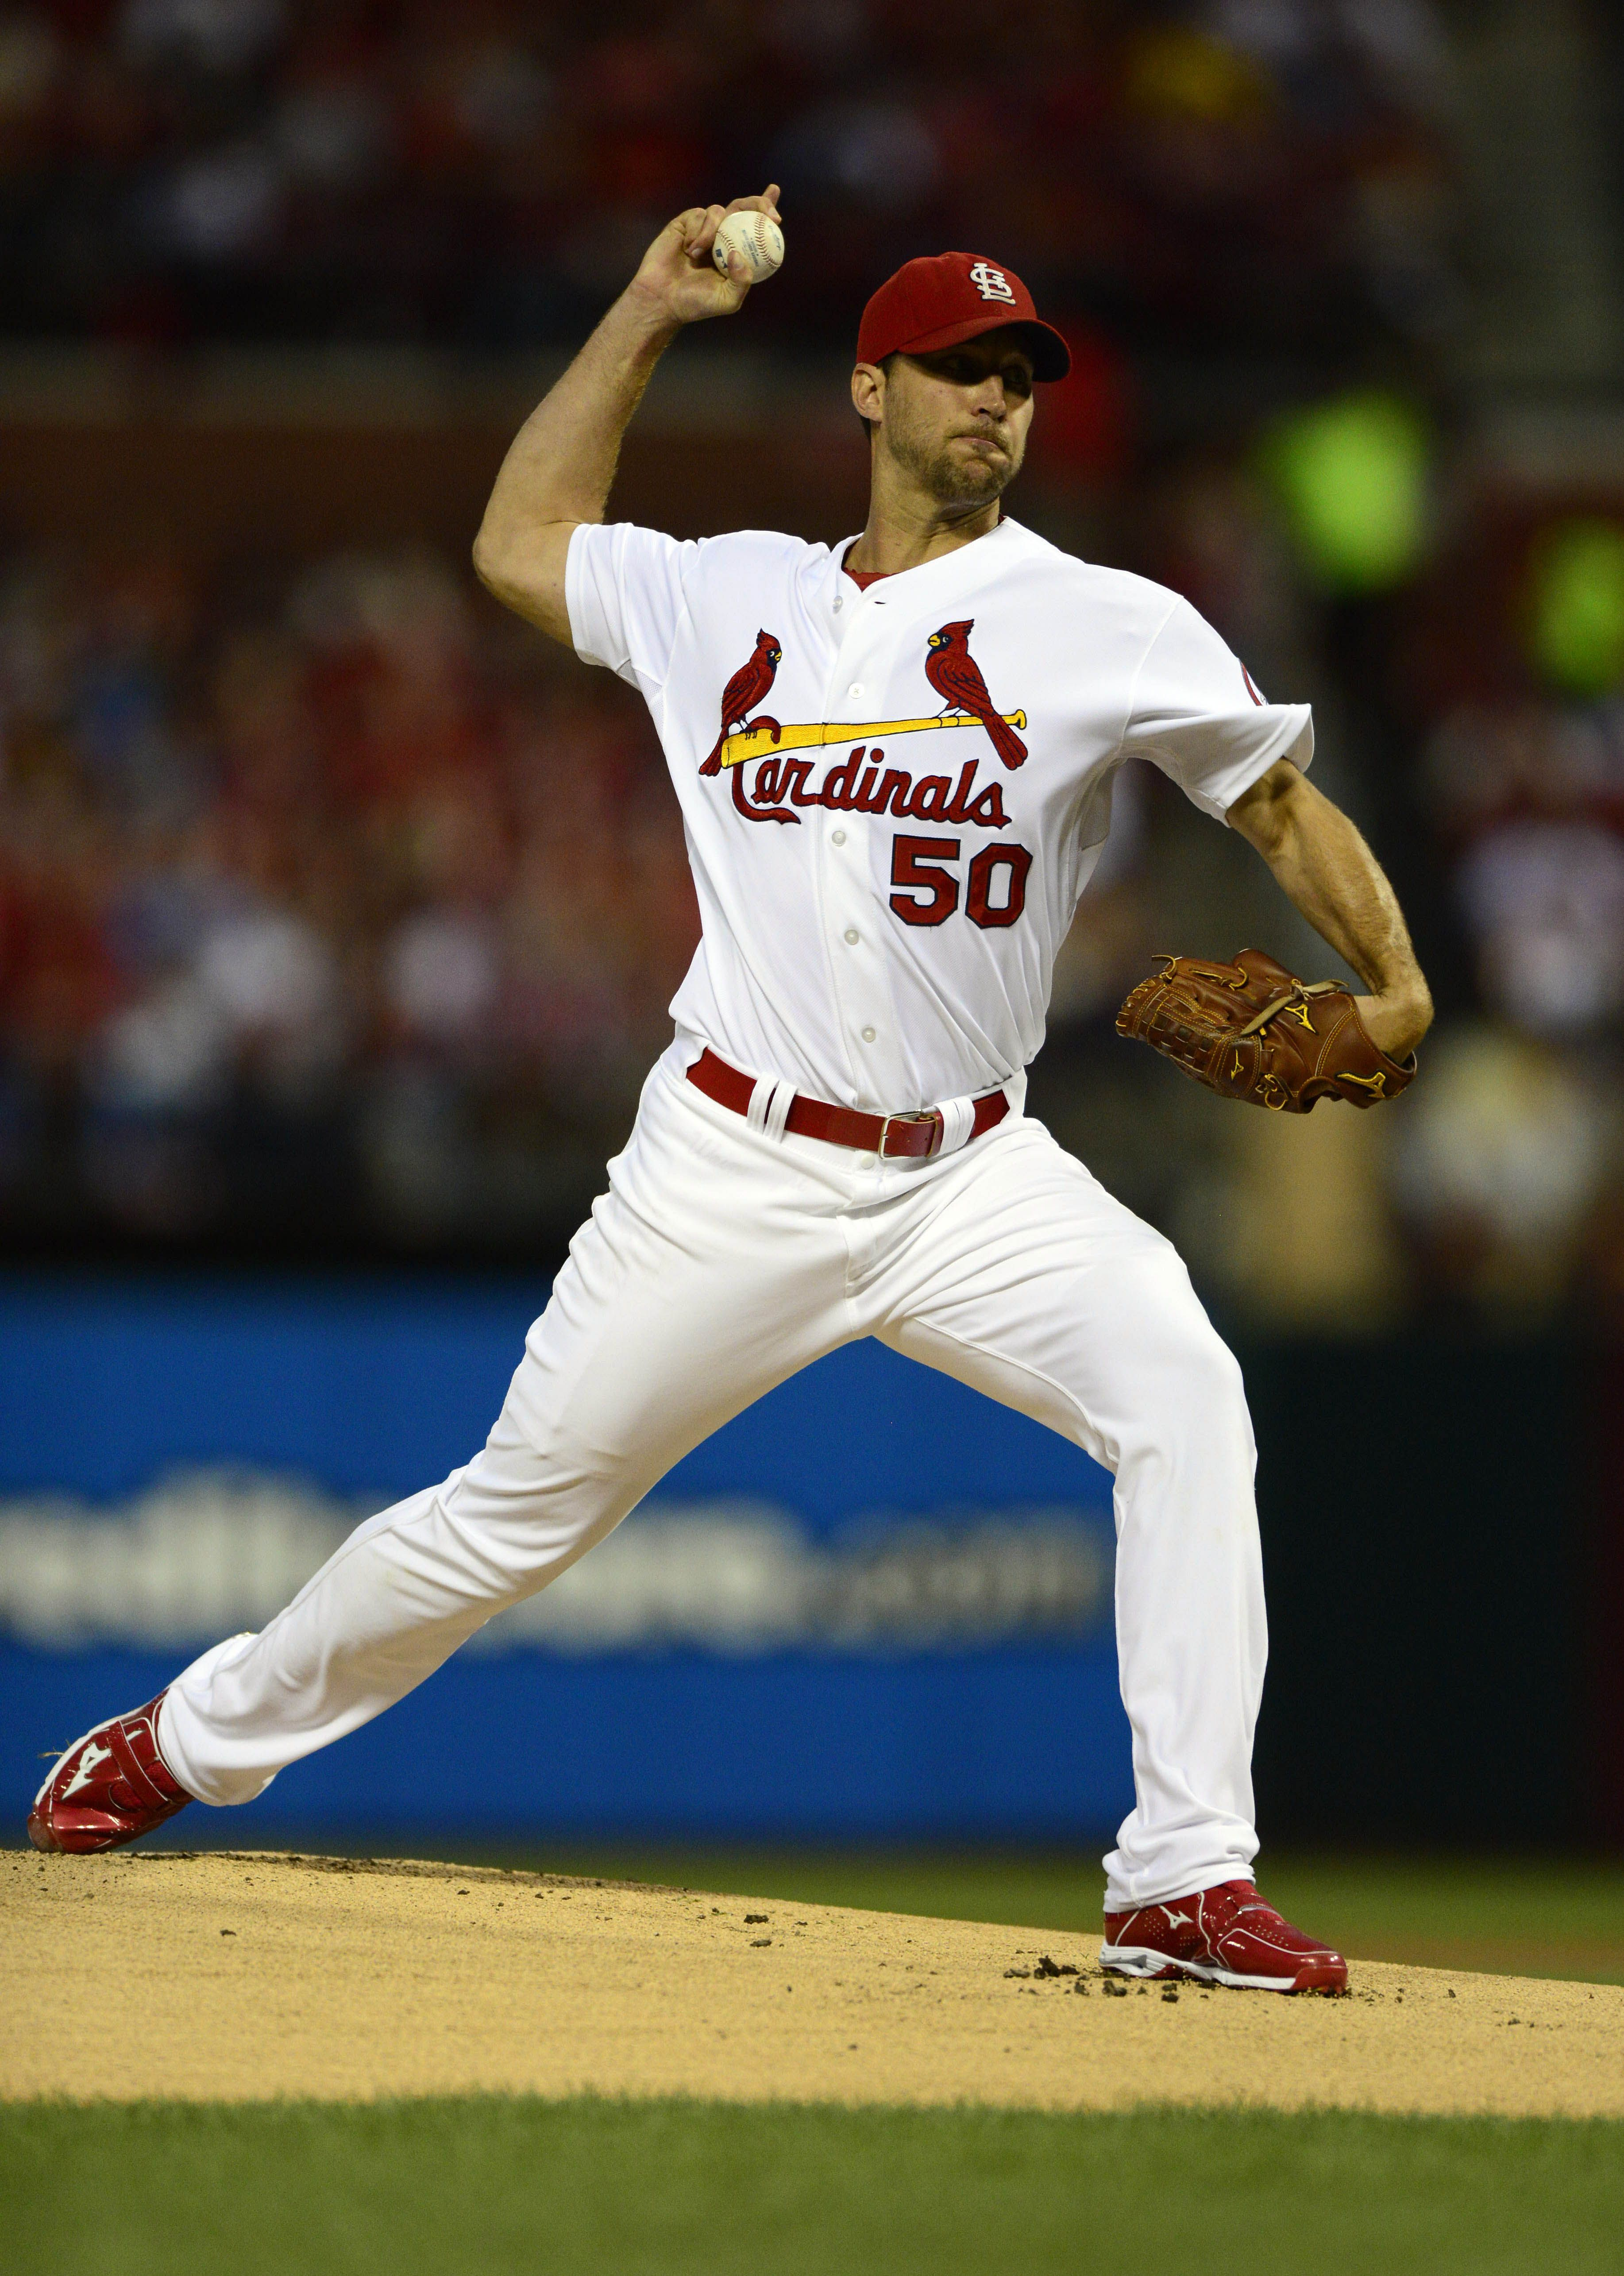 CrowdCam Hot Shot St. Louis Cardinals starting pitcher